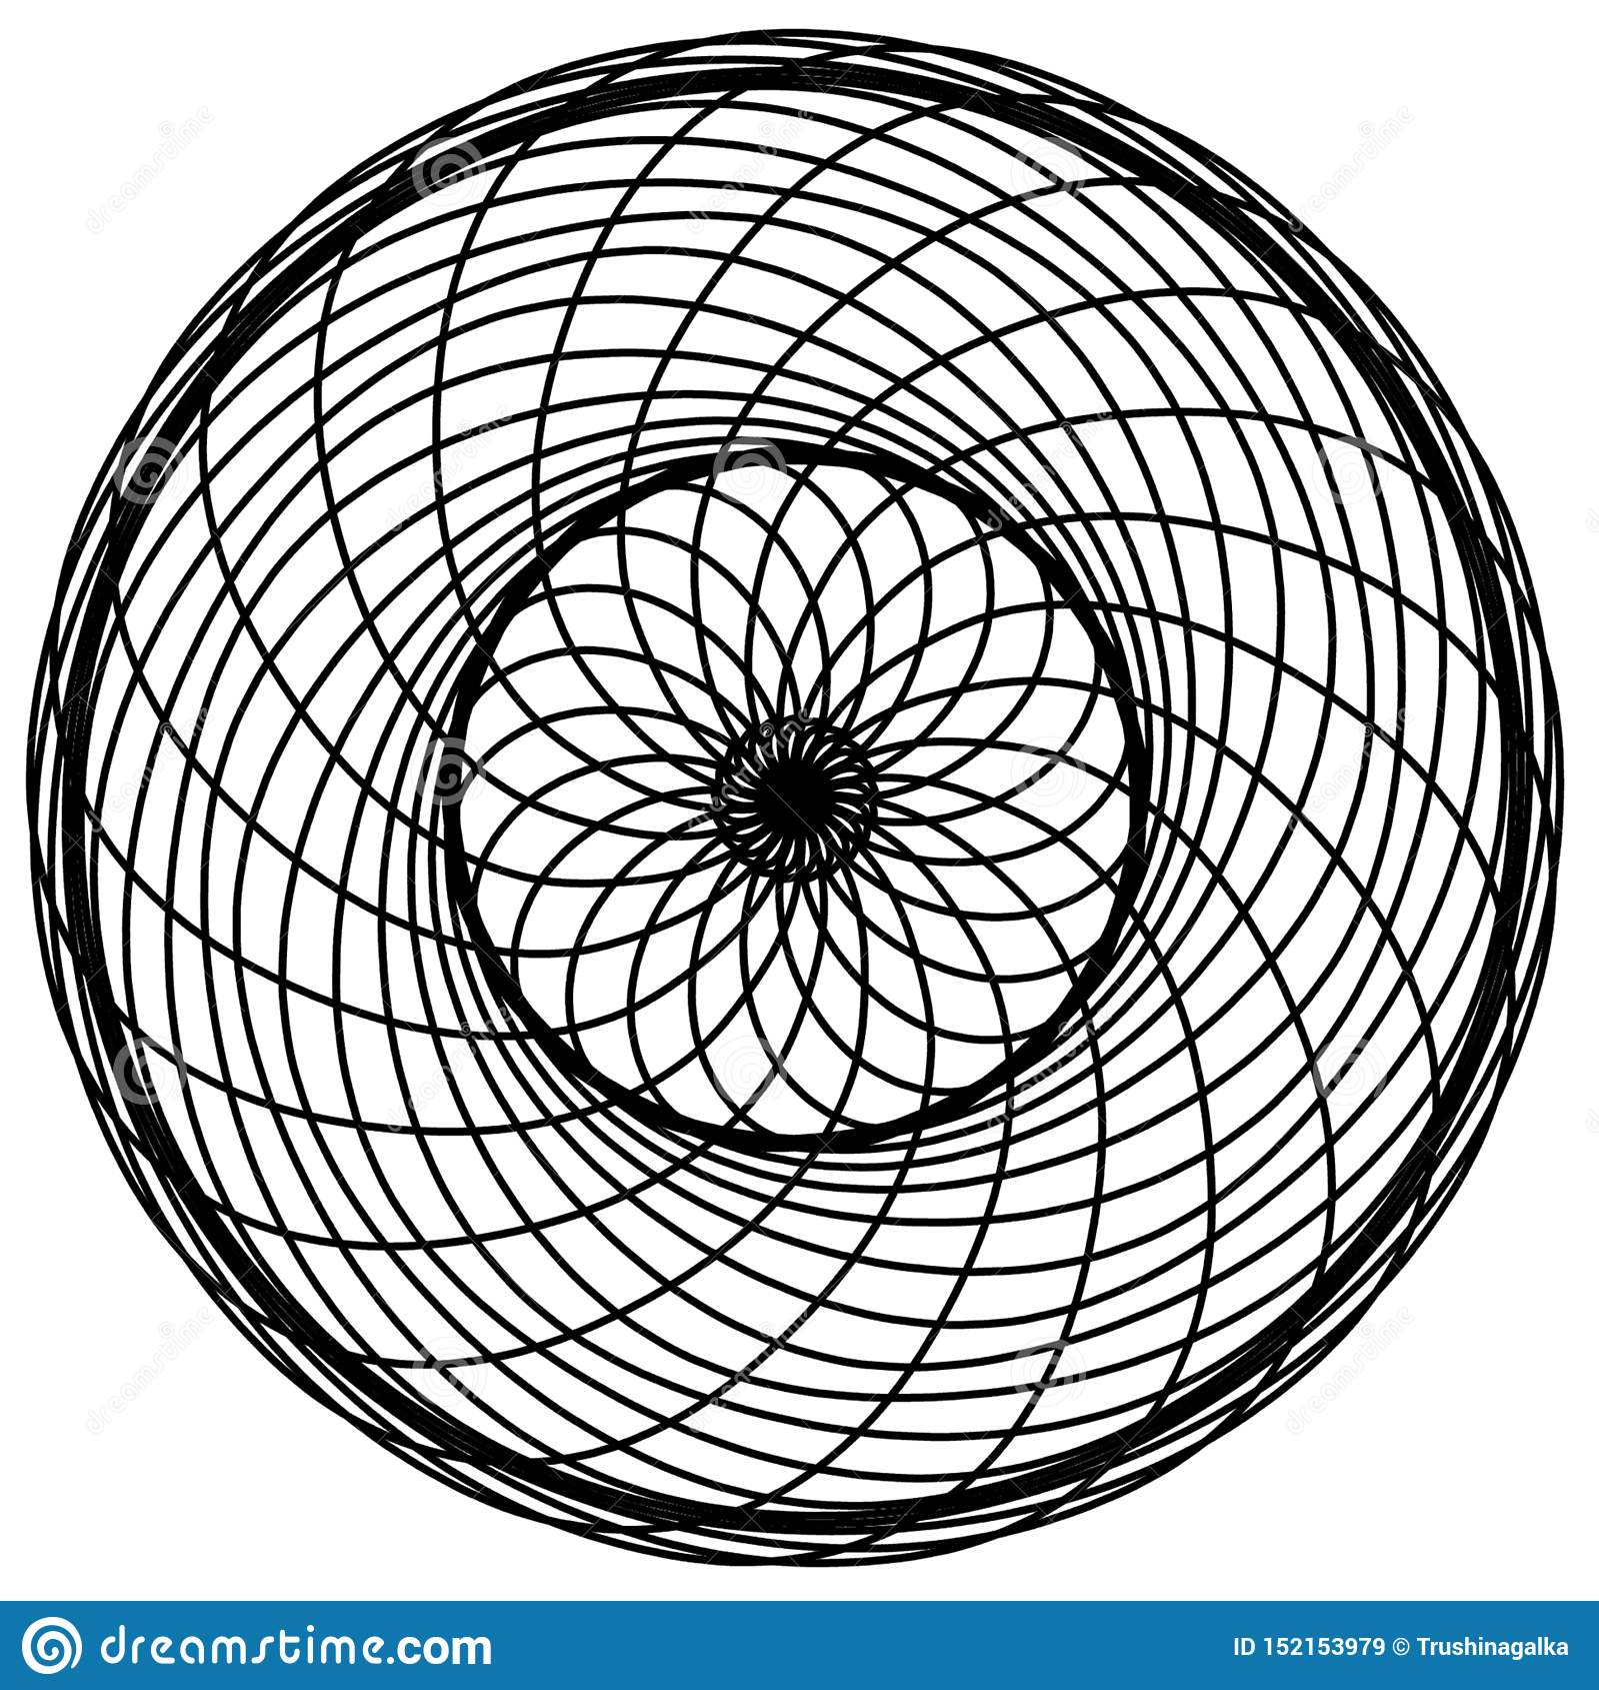 Abstract circles elements. Dreamcatcher. Astrology, spirituality, magic symbol. Ethnic tribal element